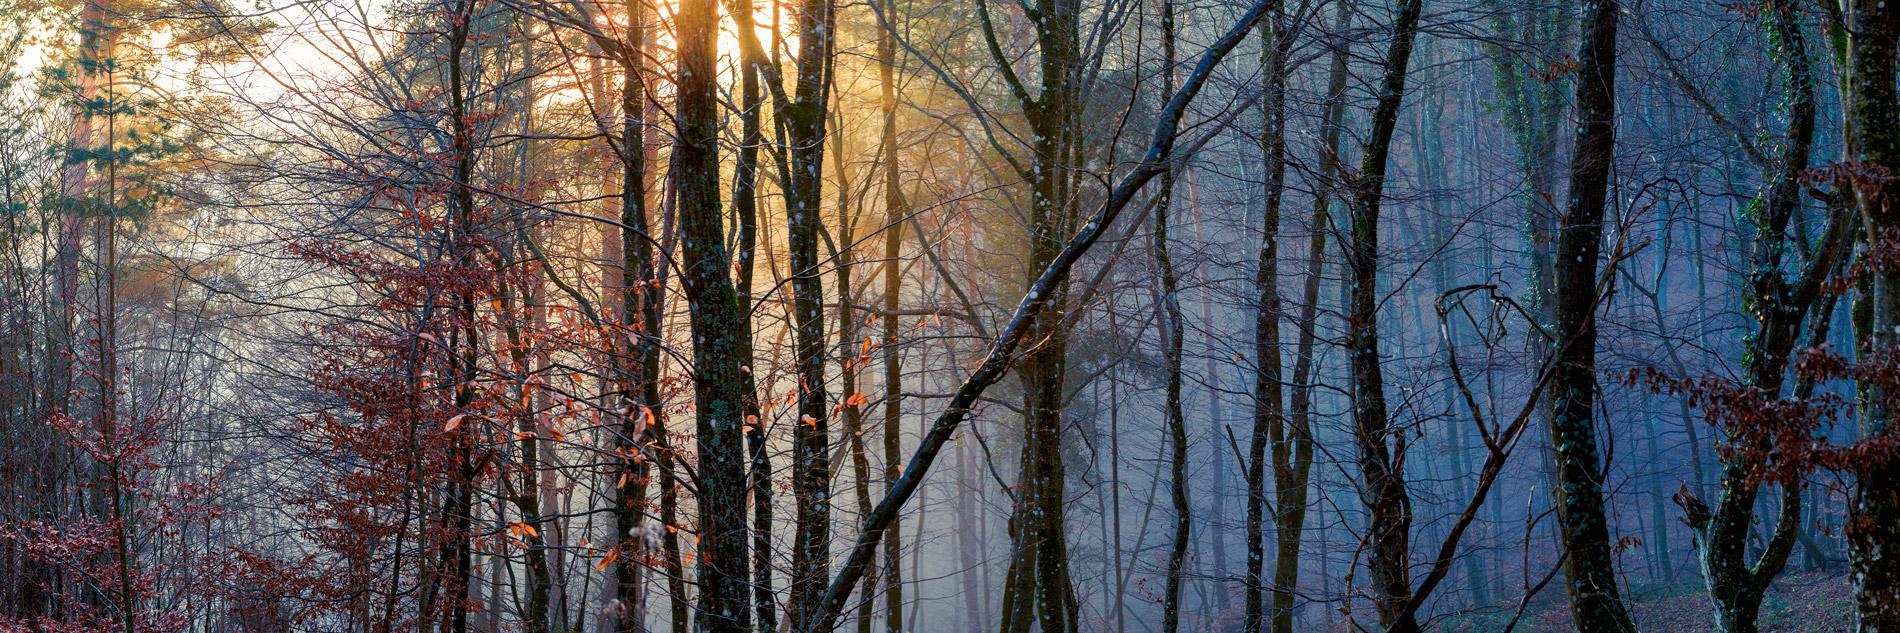 Forêt d'Andlau